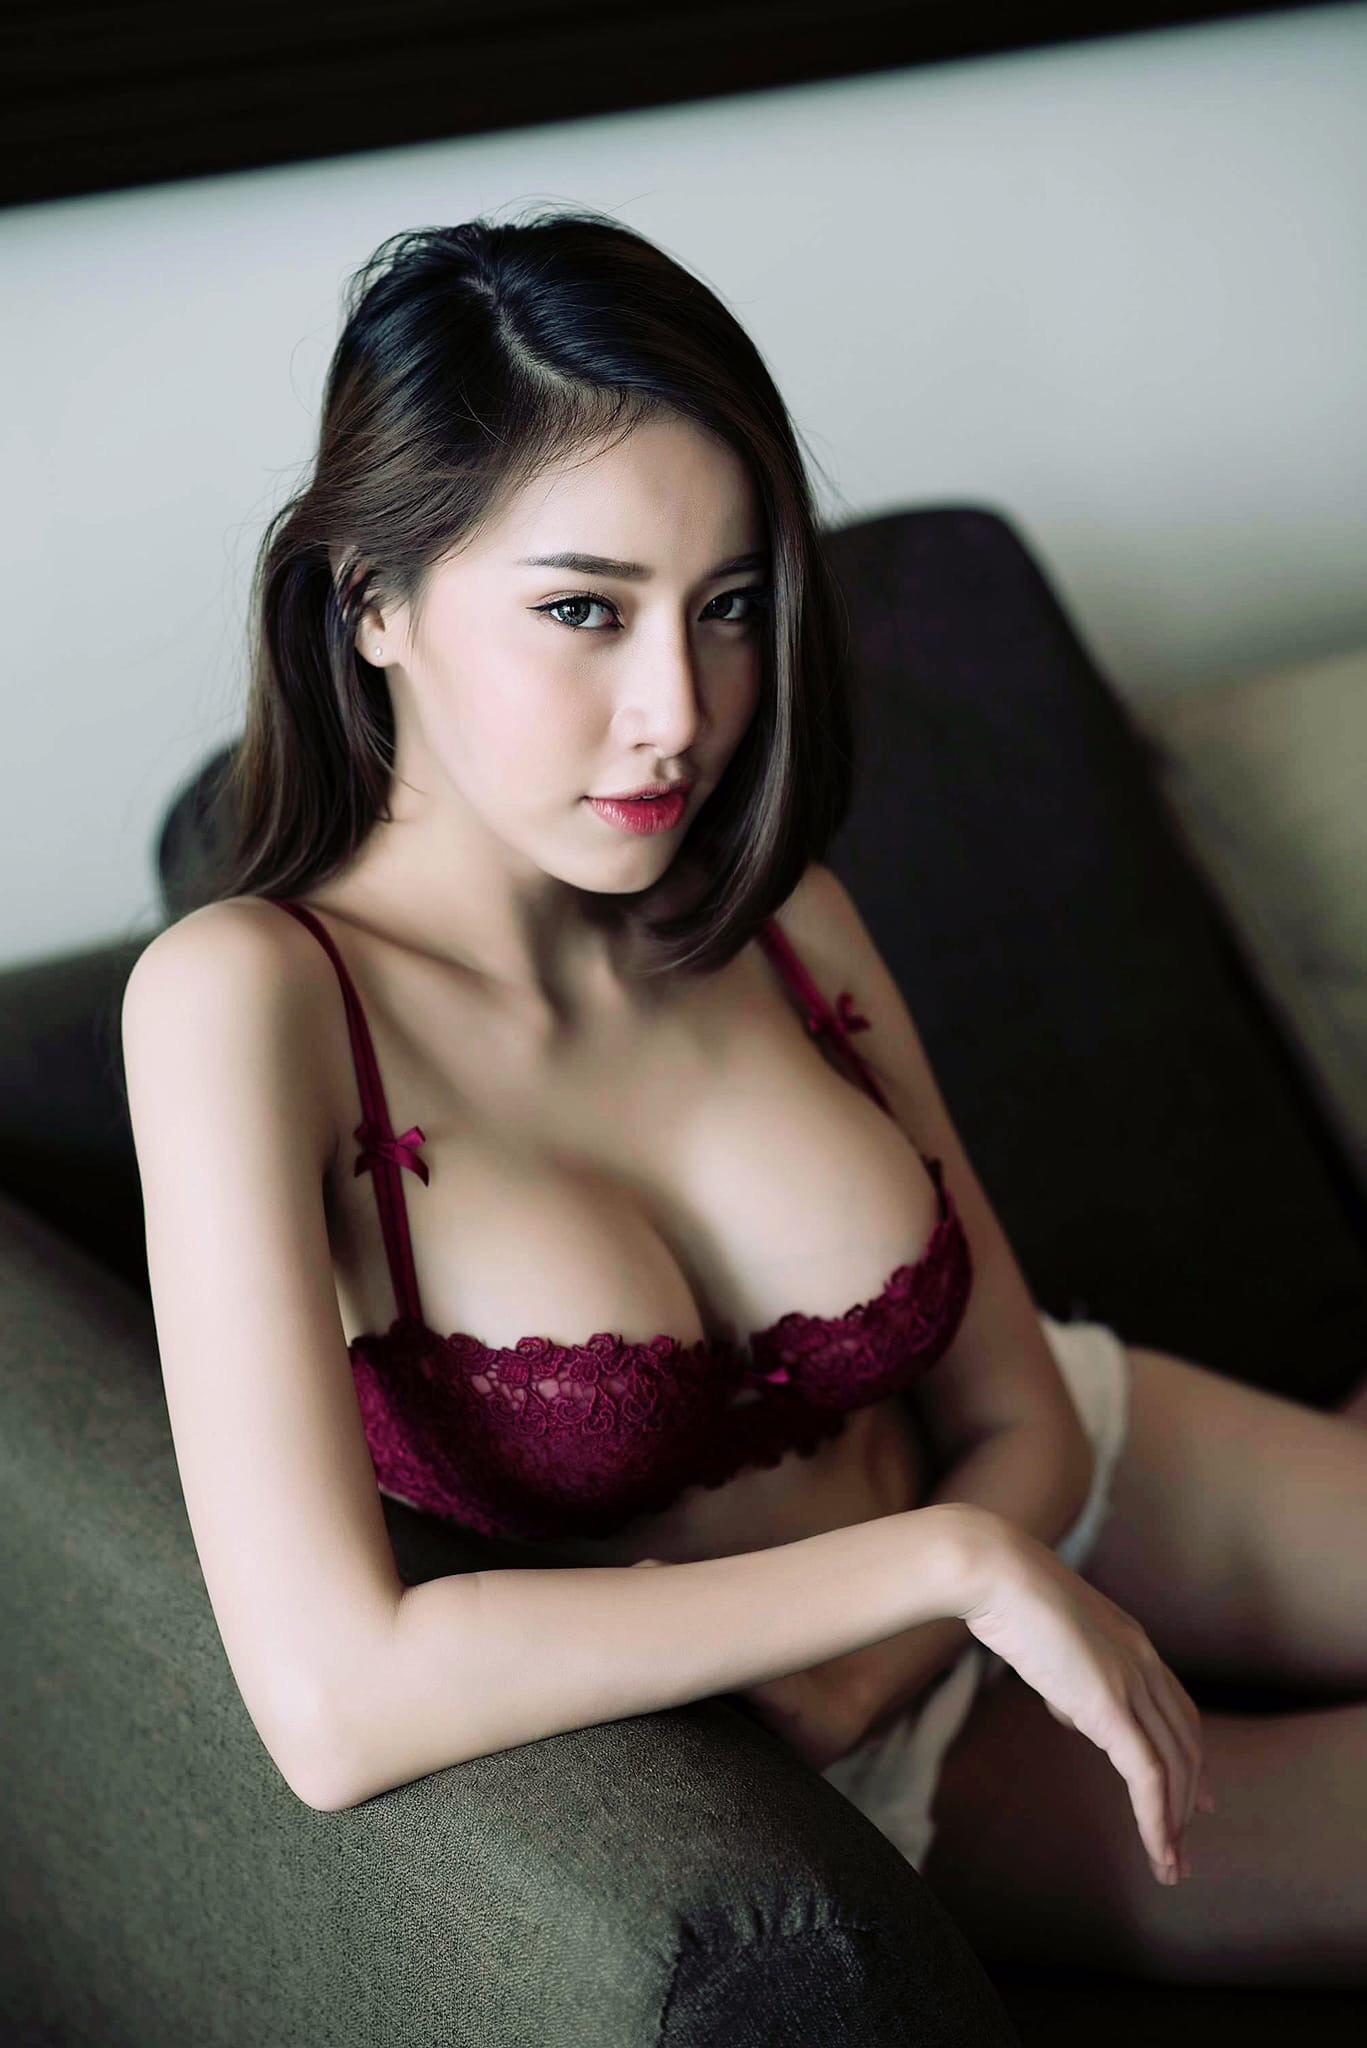 rotten-cumshot-asian-nude-vinyl-bra